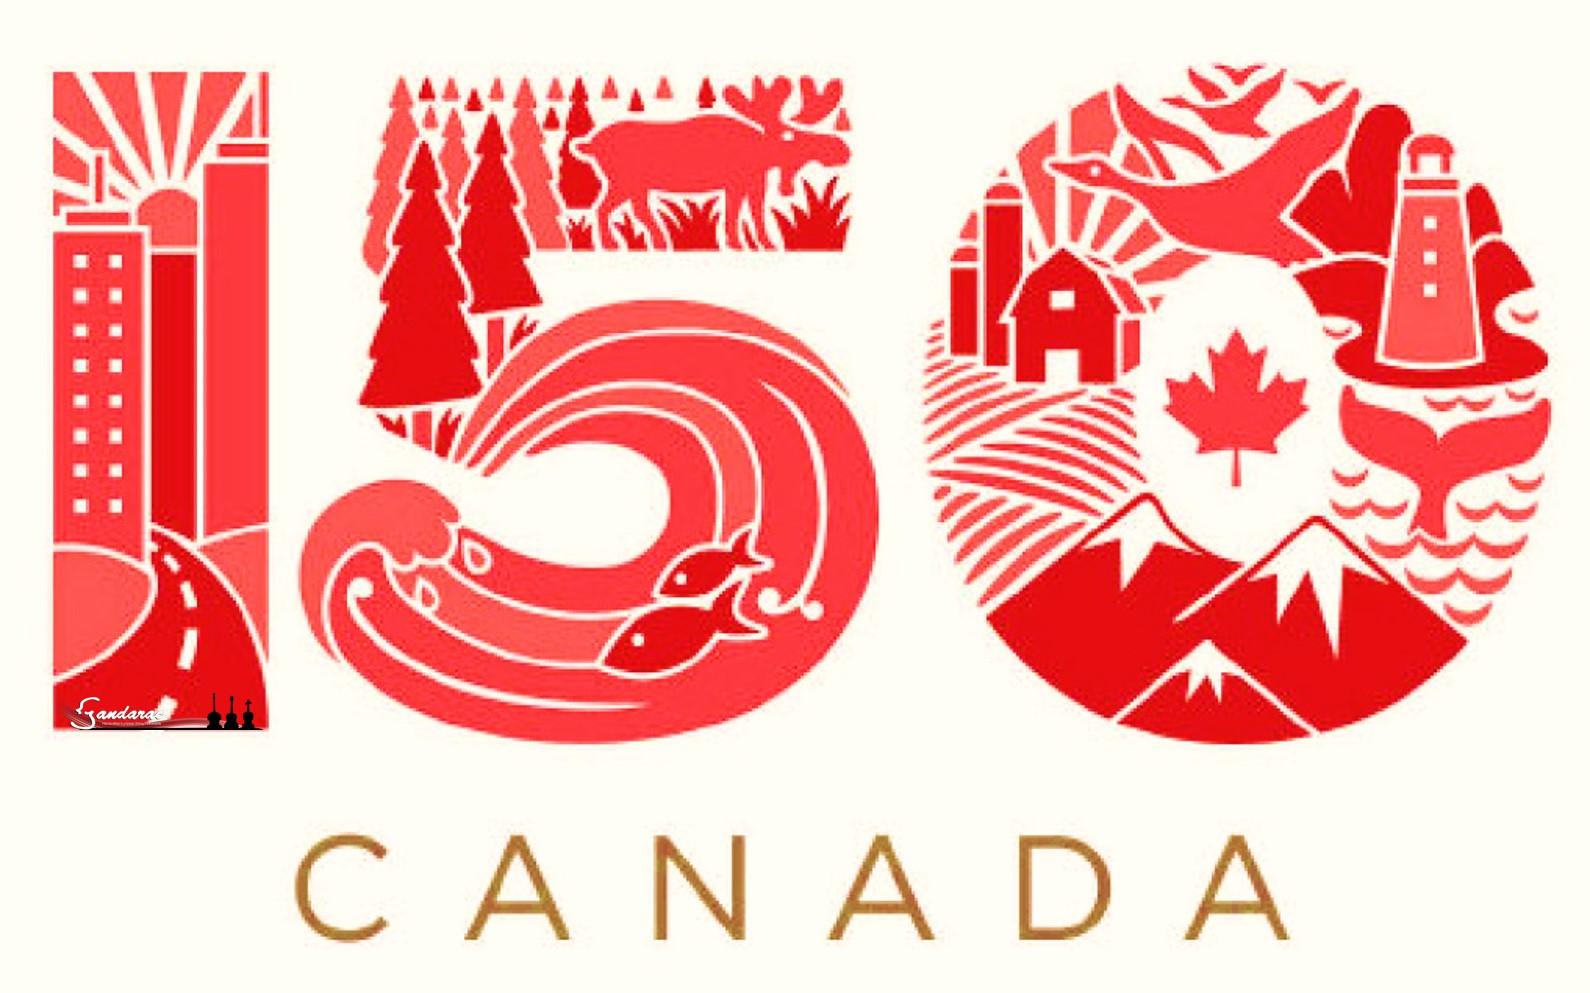 01 - Canada Day